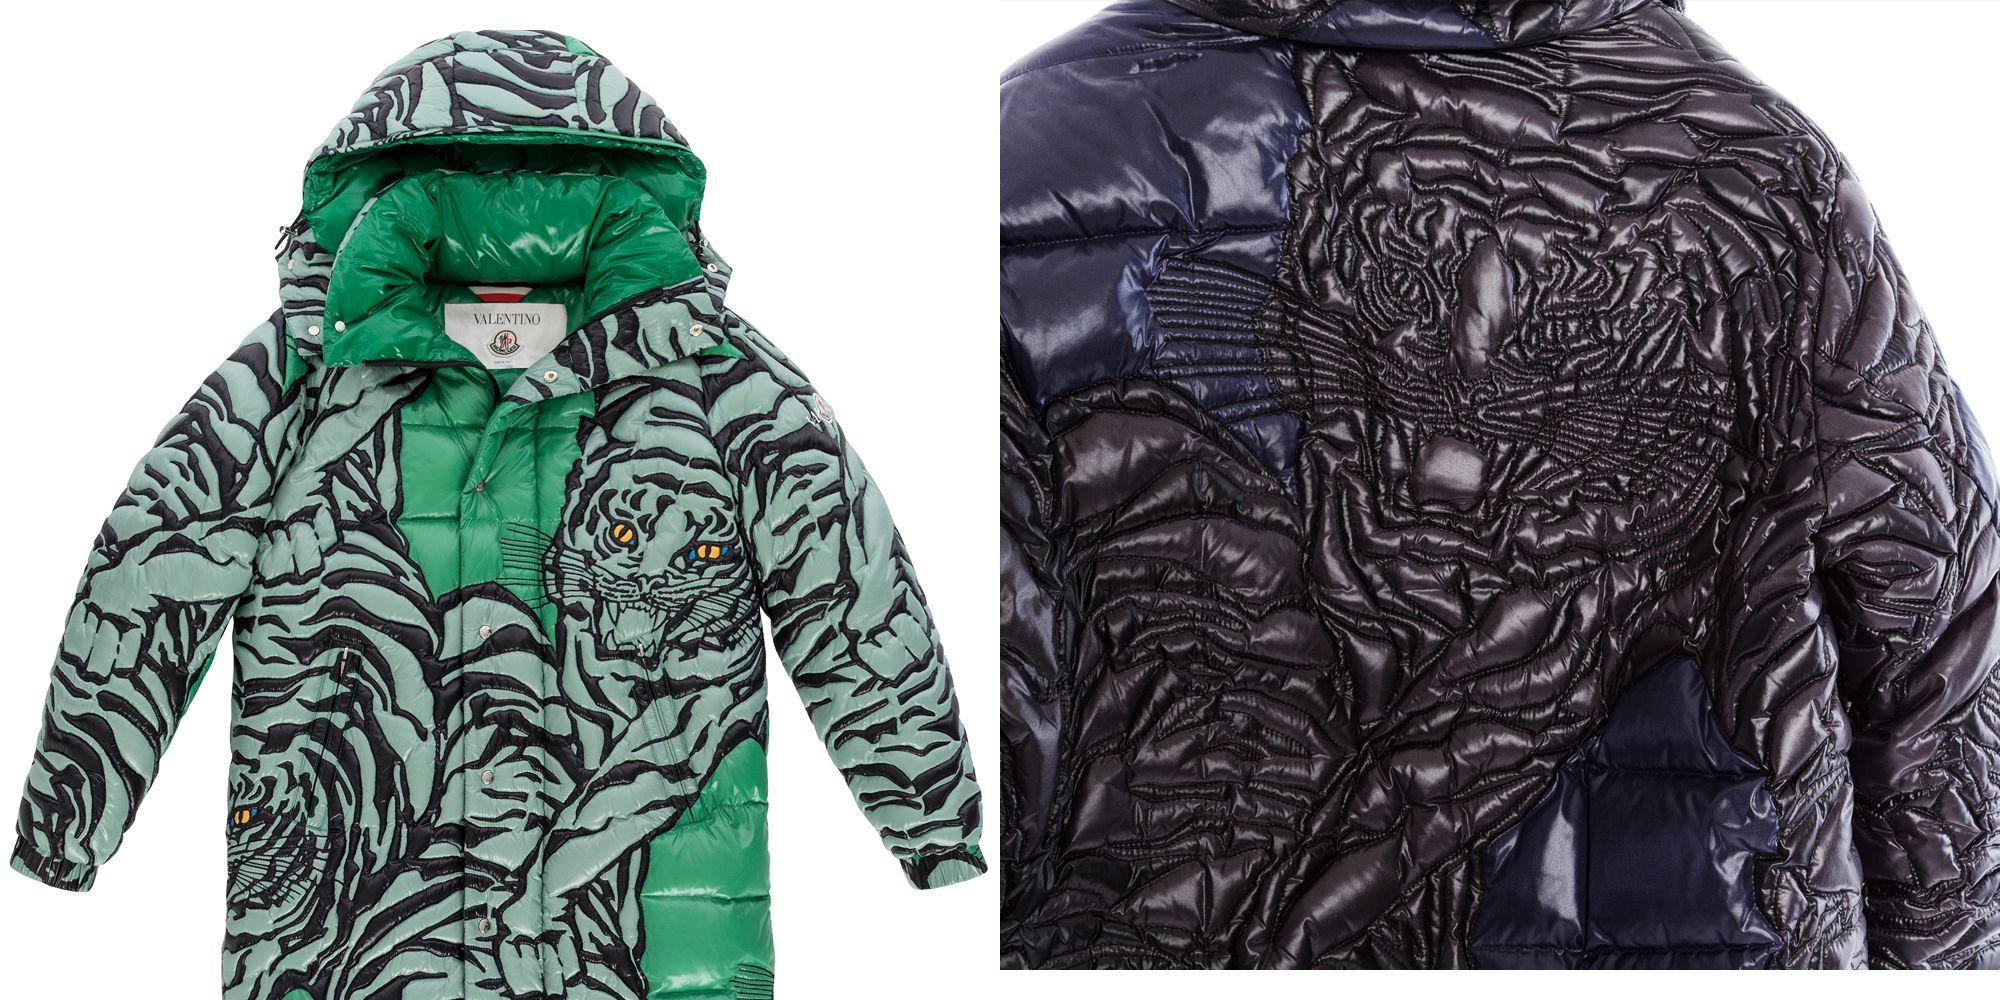 moncler jacket winter